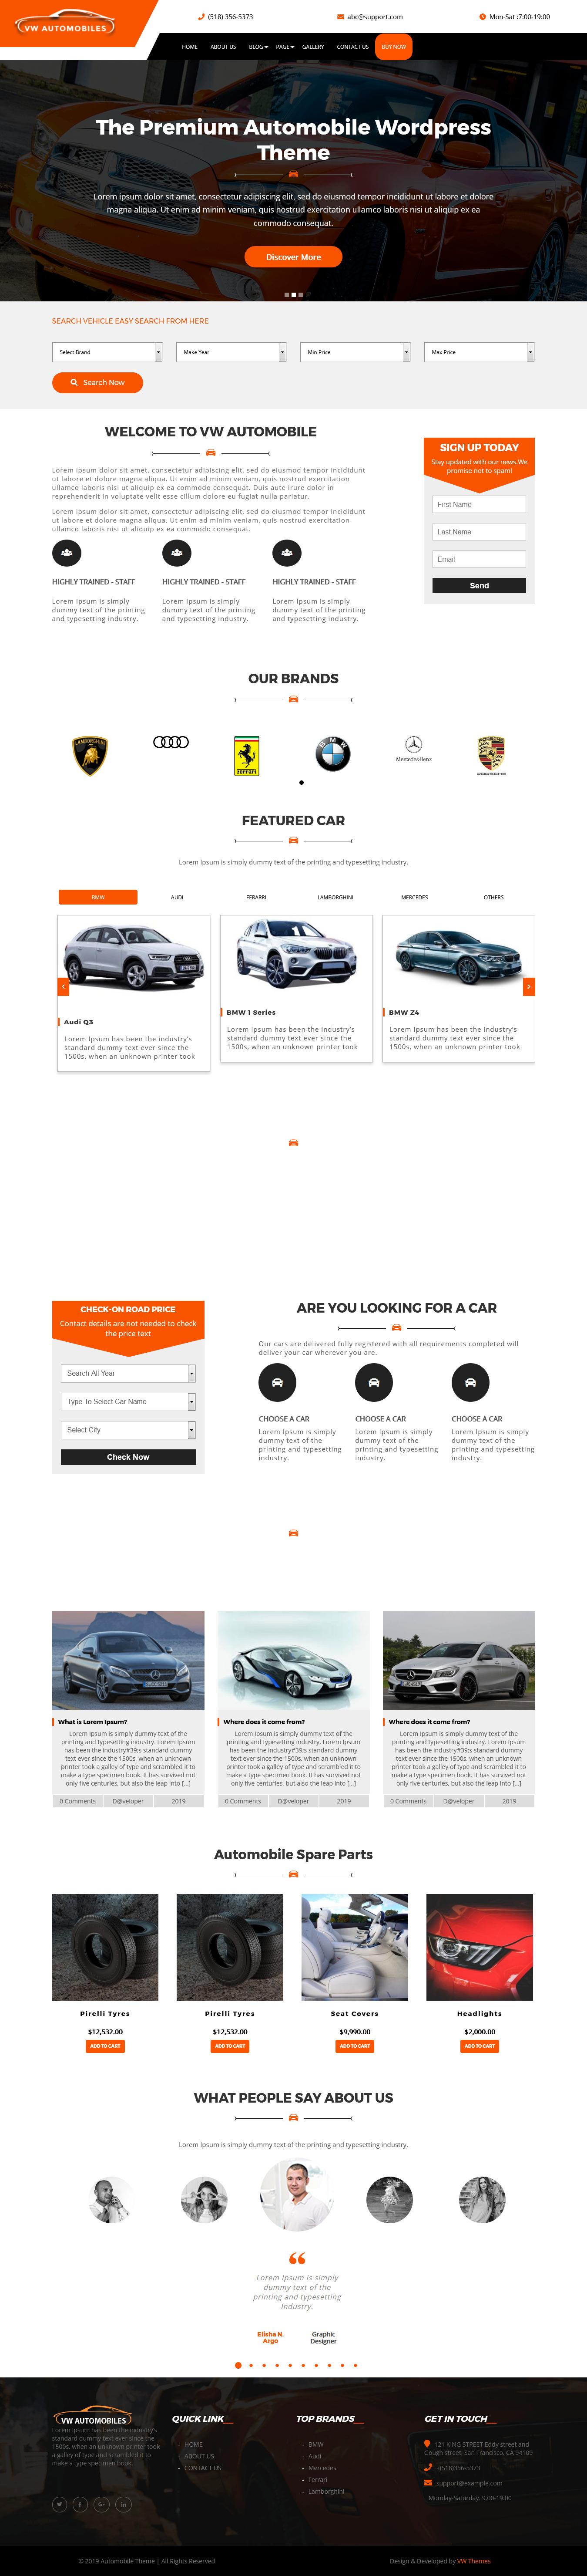 vw automobile best free automobile wordpress theme - 10+ Best Free Automobile WordPress Themes